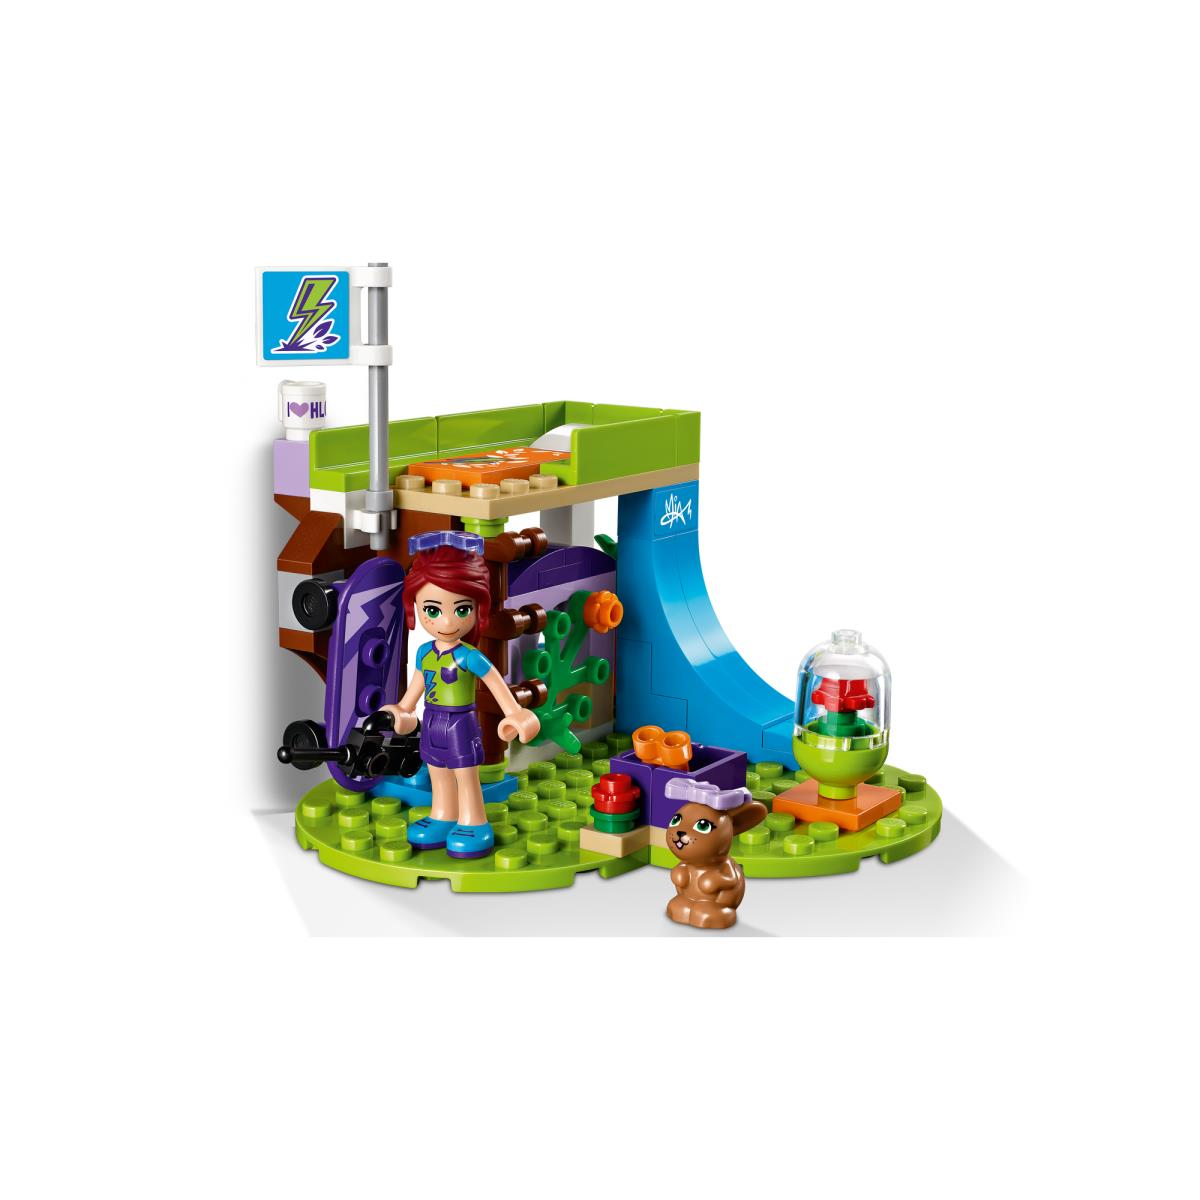 Lego Friends 41327 Mias Zimmer,Lego,000051353732, 5702016111279